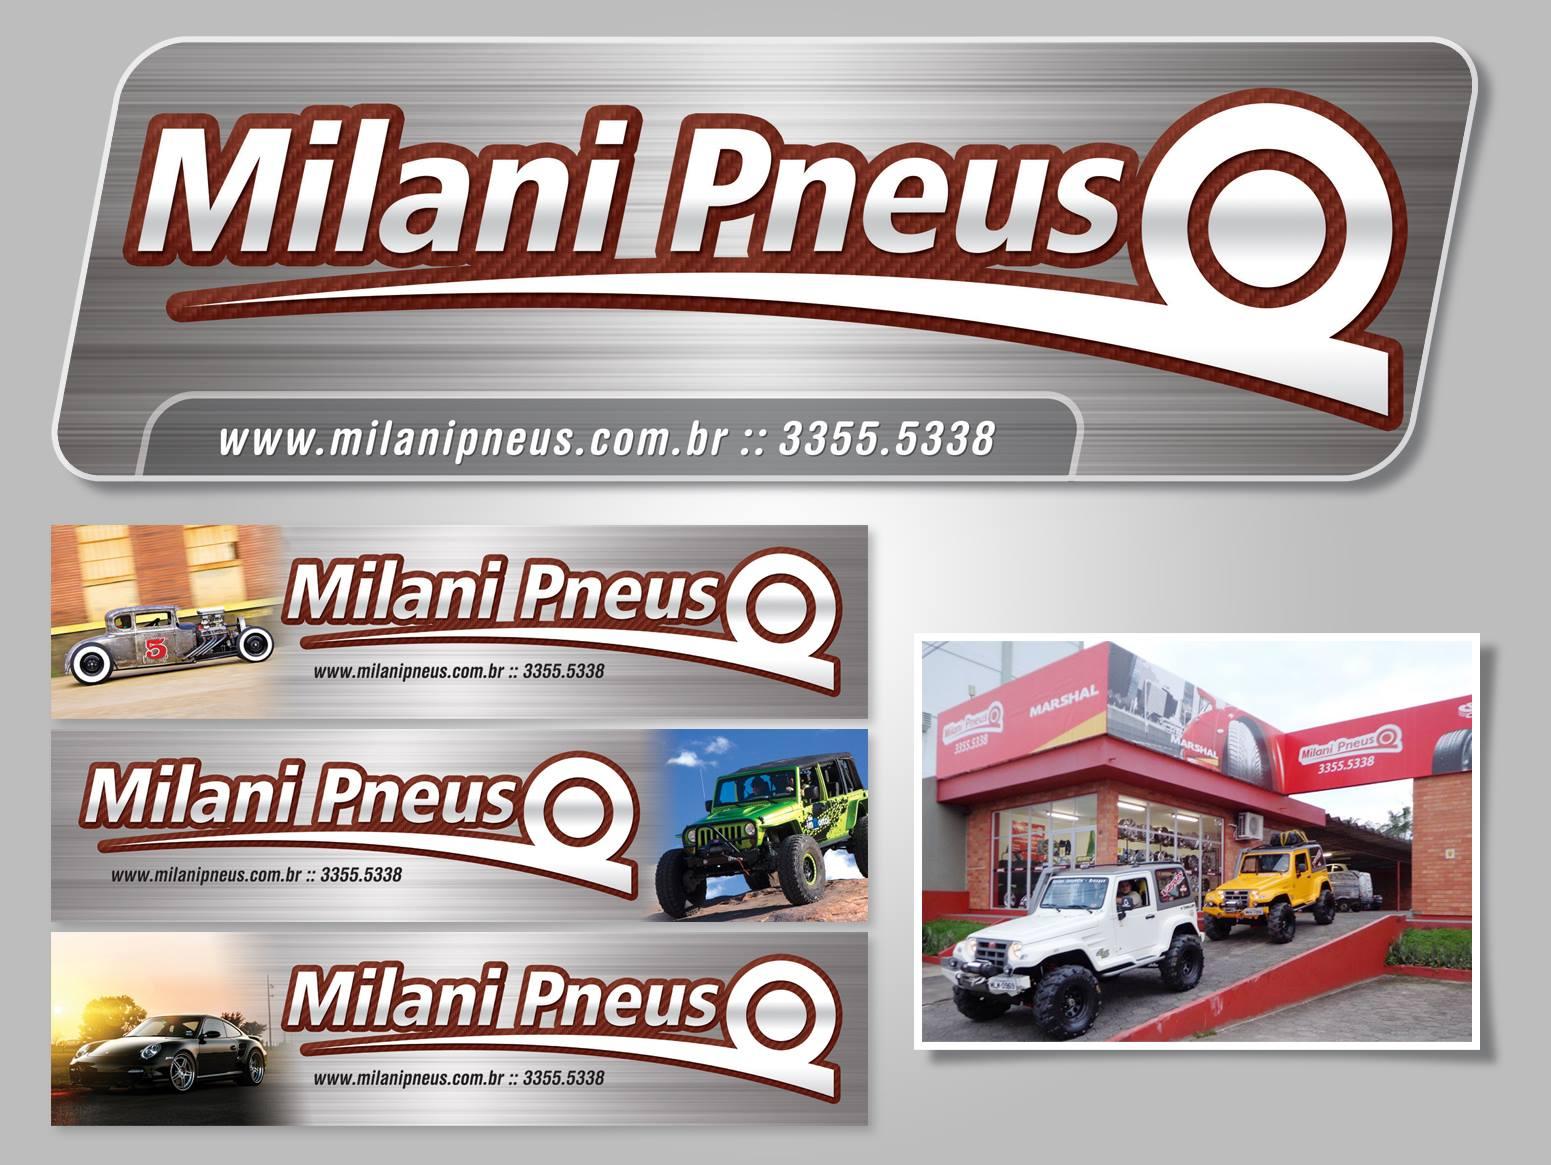 Adesivo e quadros - Milani Pneus